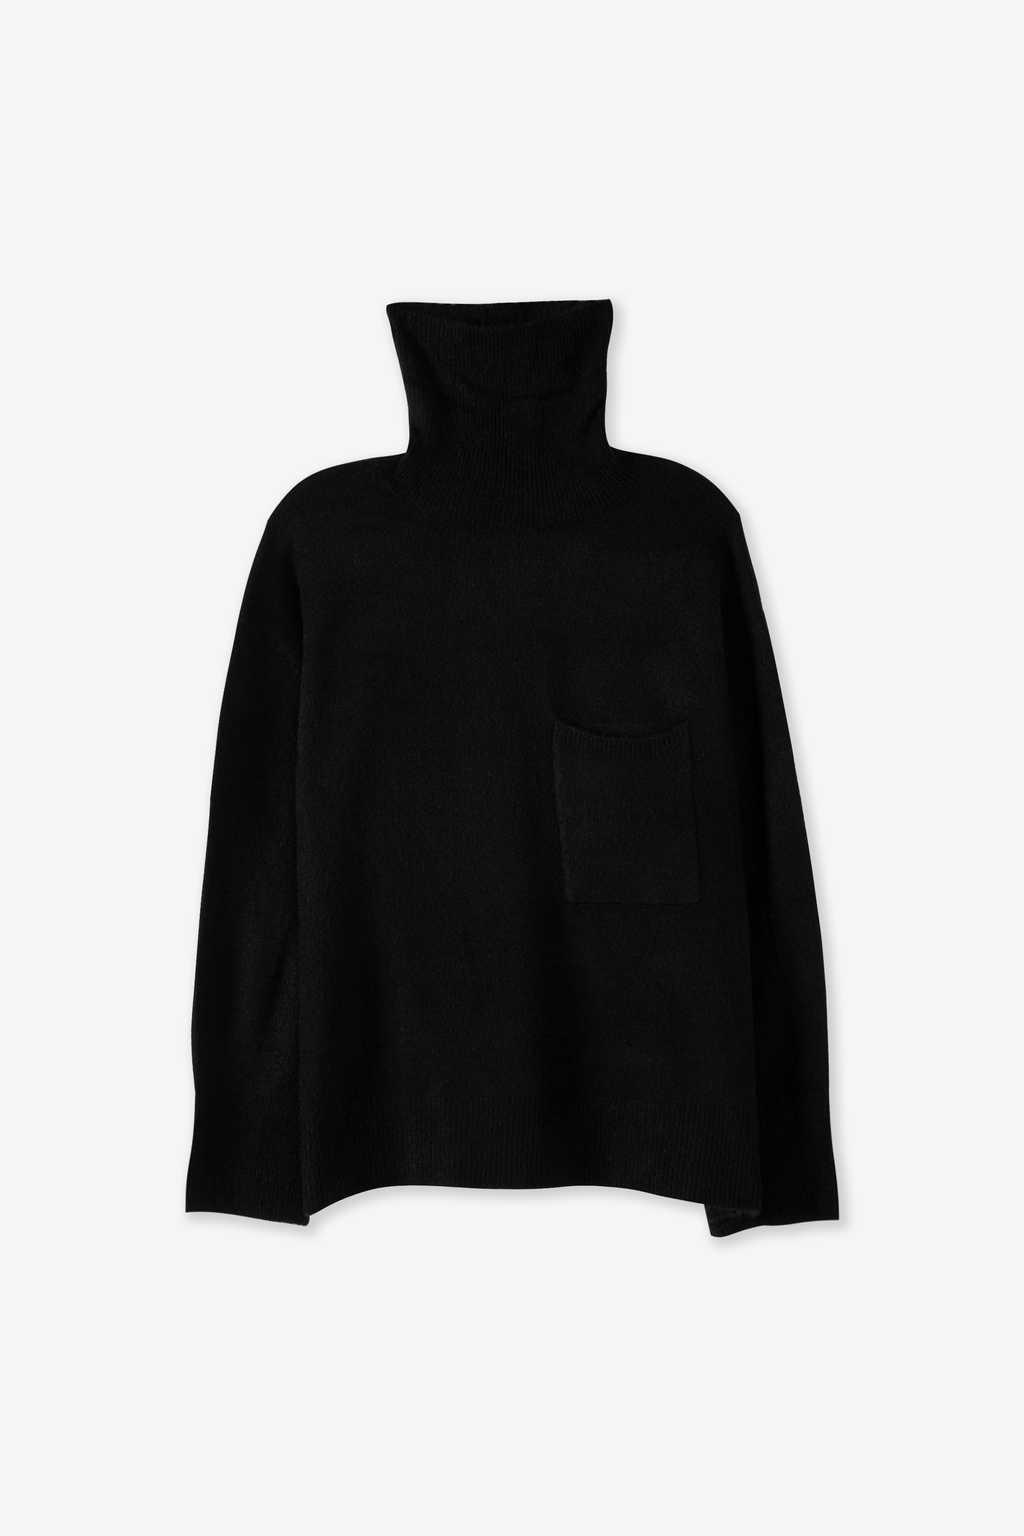 Sweater 2406 Black 8